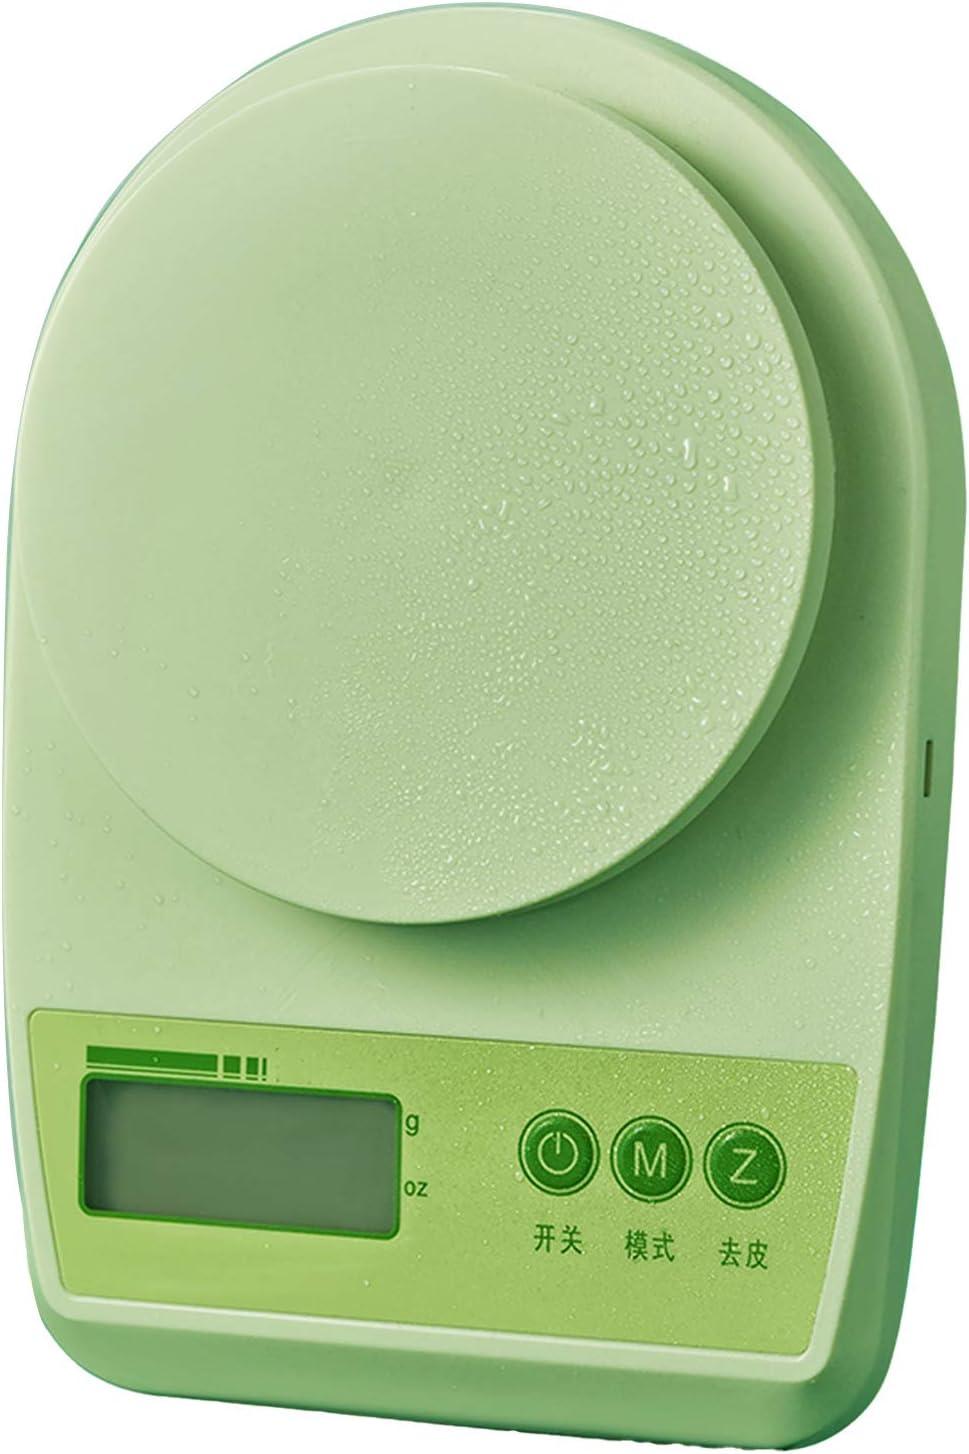 KOMOSO 1 pc digital de cocina báscula de pesaje de alimentos alimentado con batería función de tara impermeable para uso en casa oficina